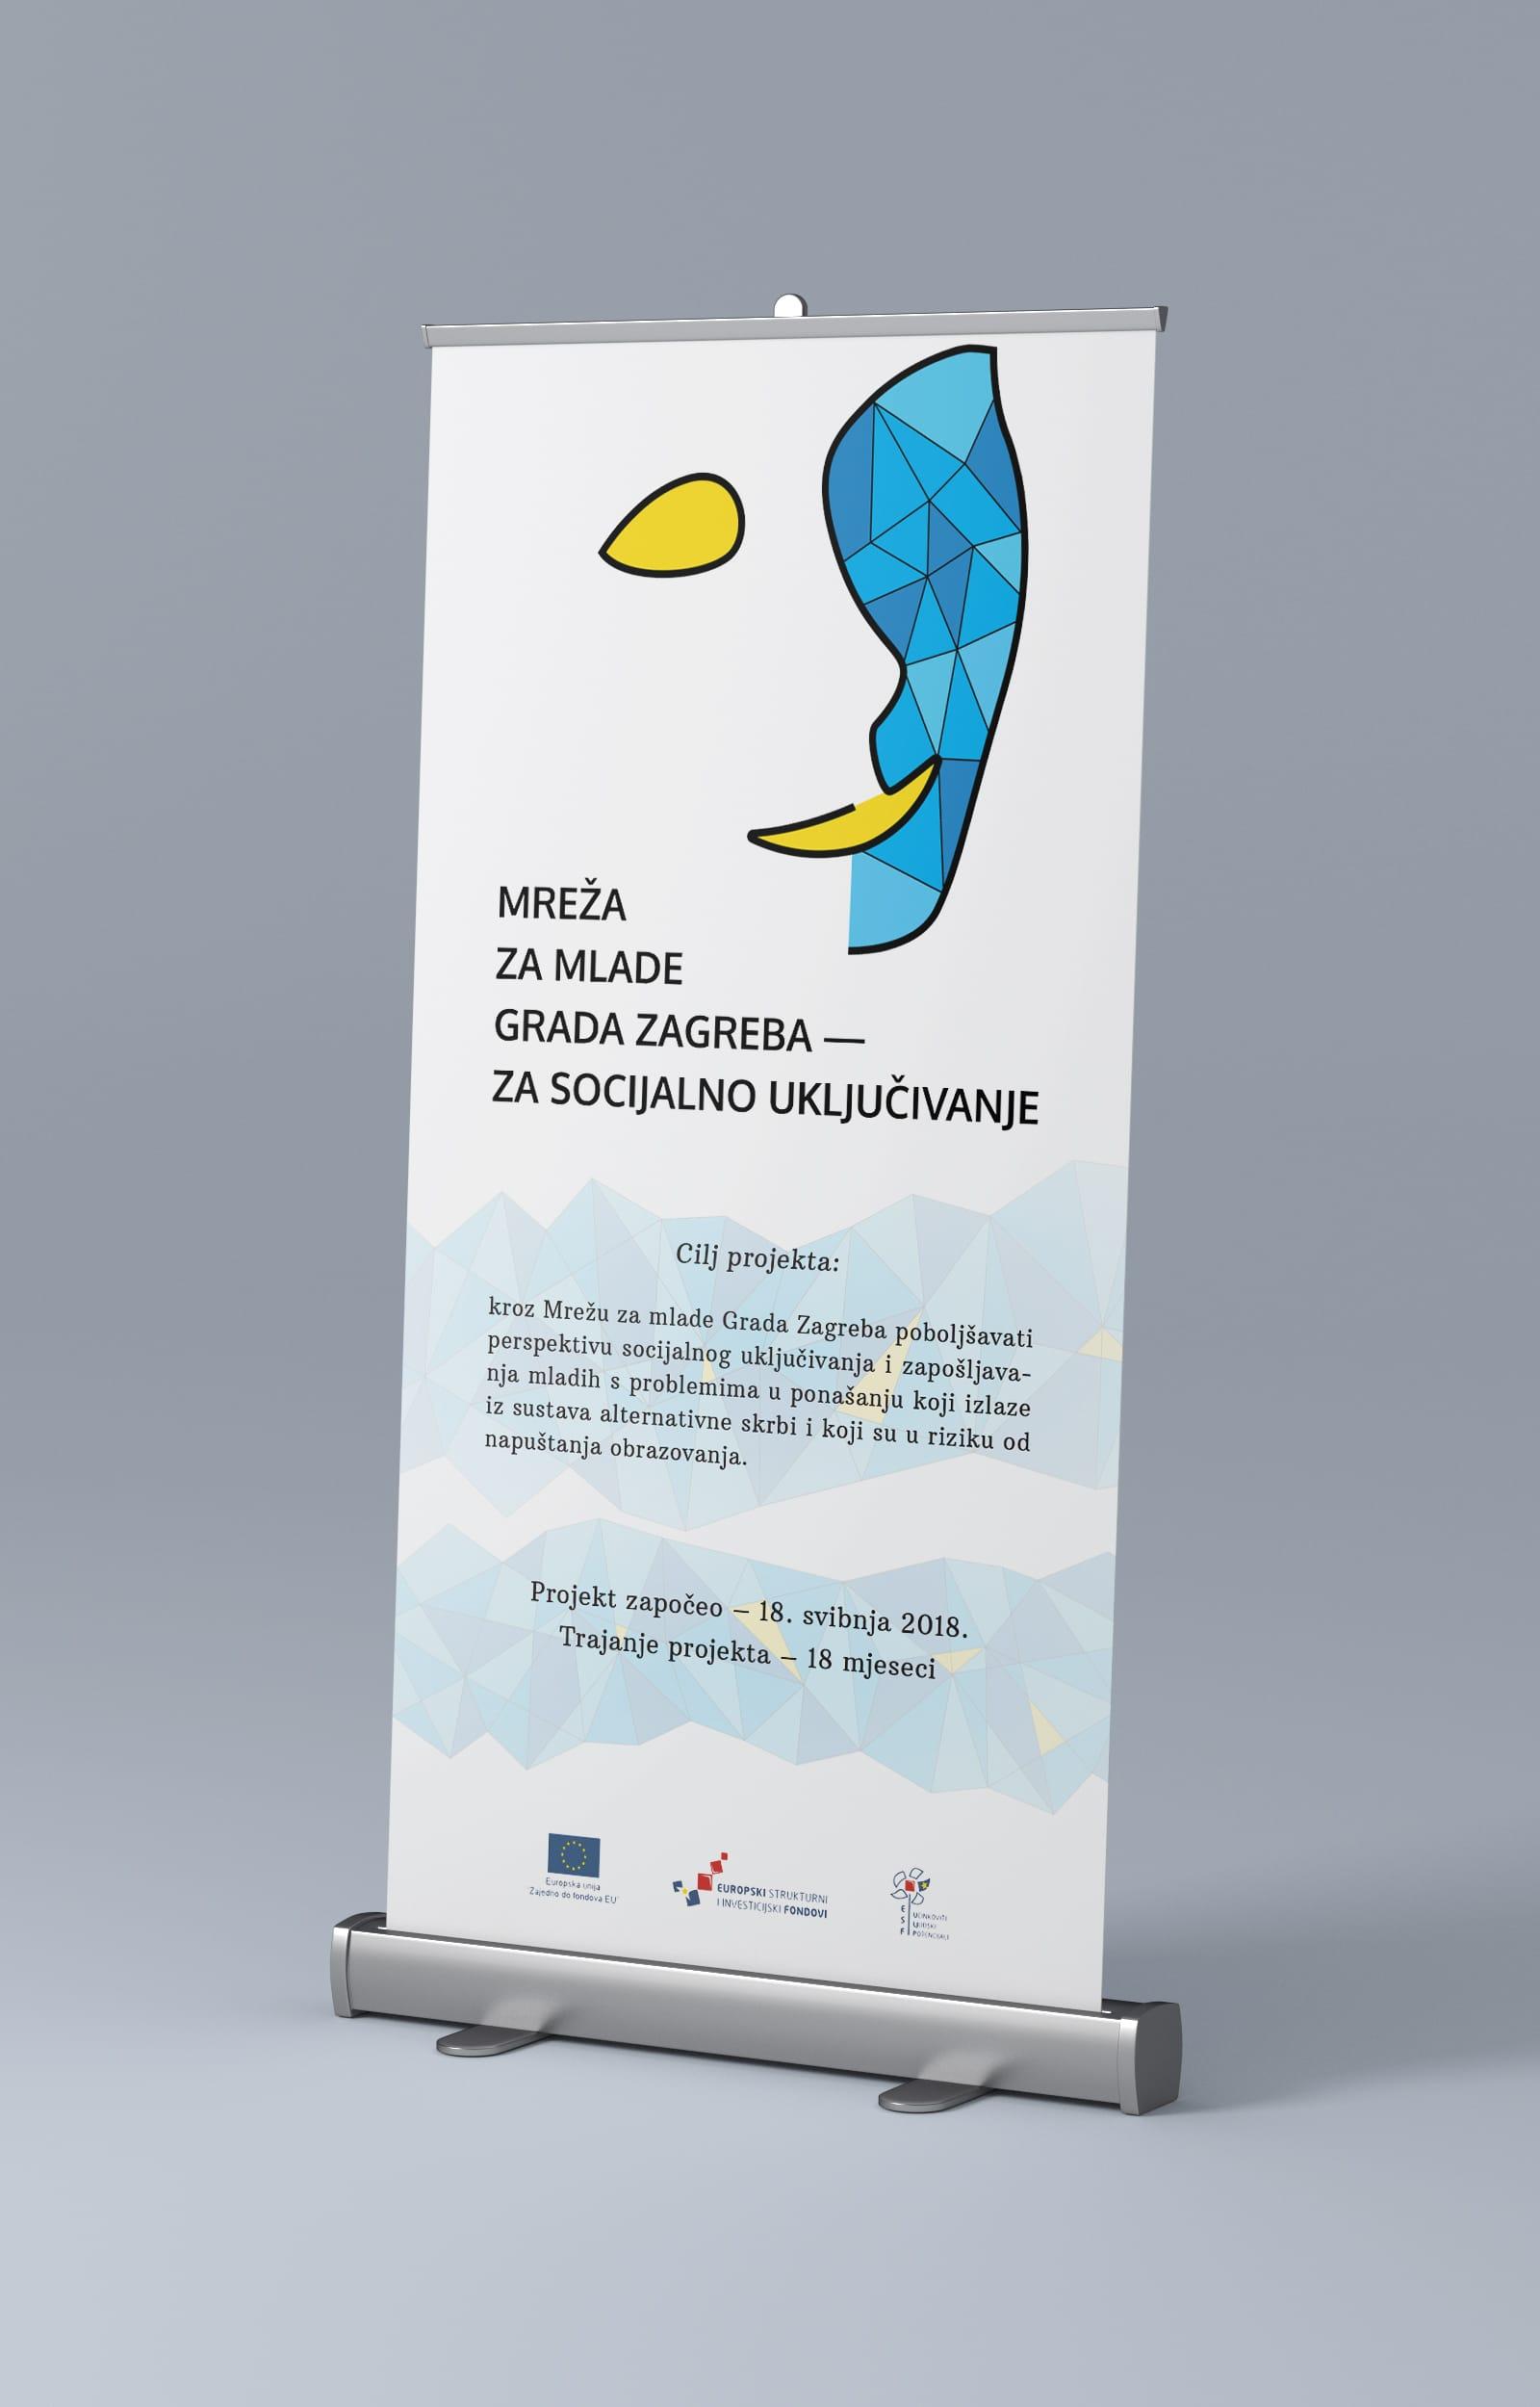 Projektna Produkcija - Projekt - Mreža za mlade grada Zagreba